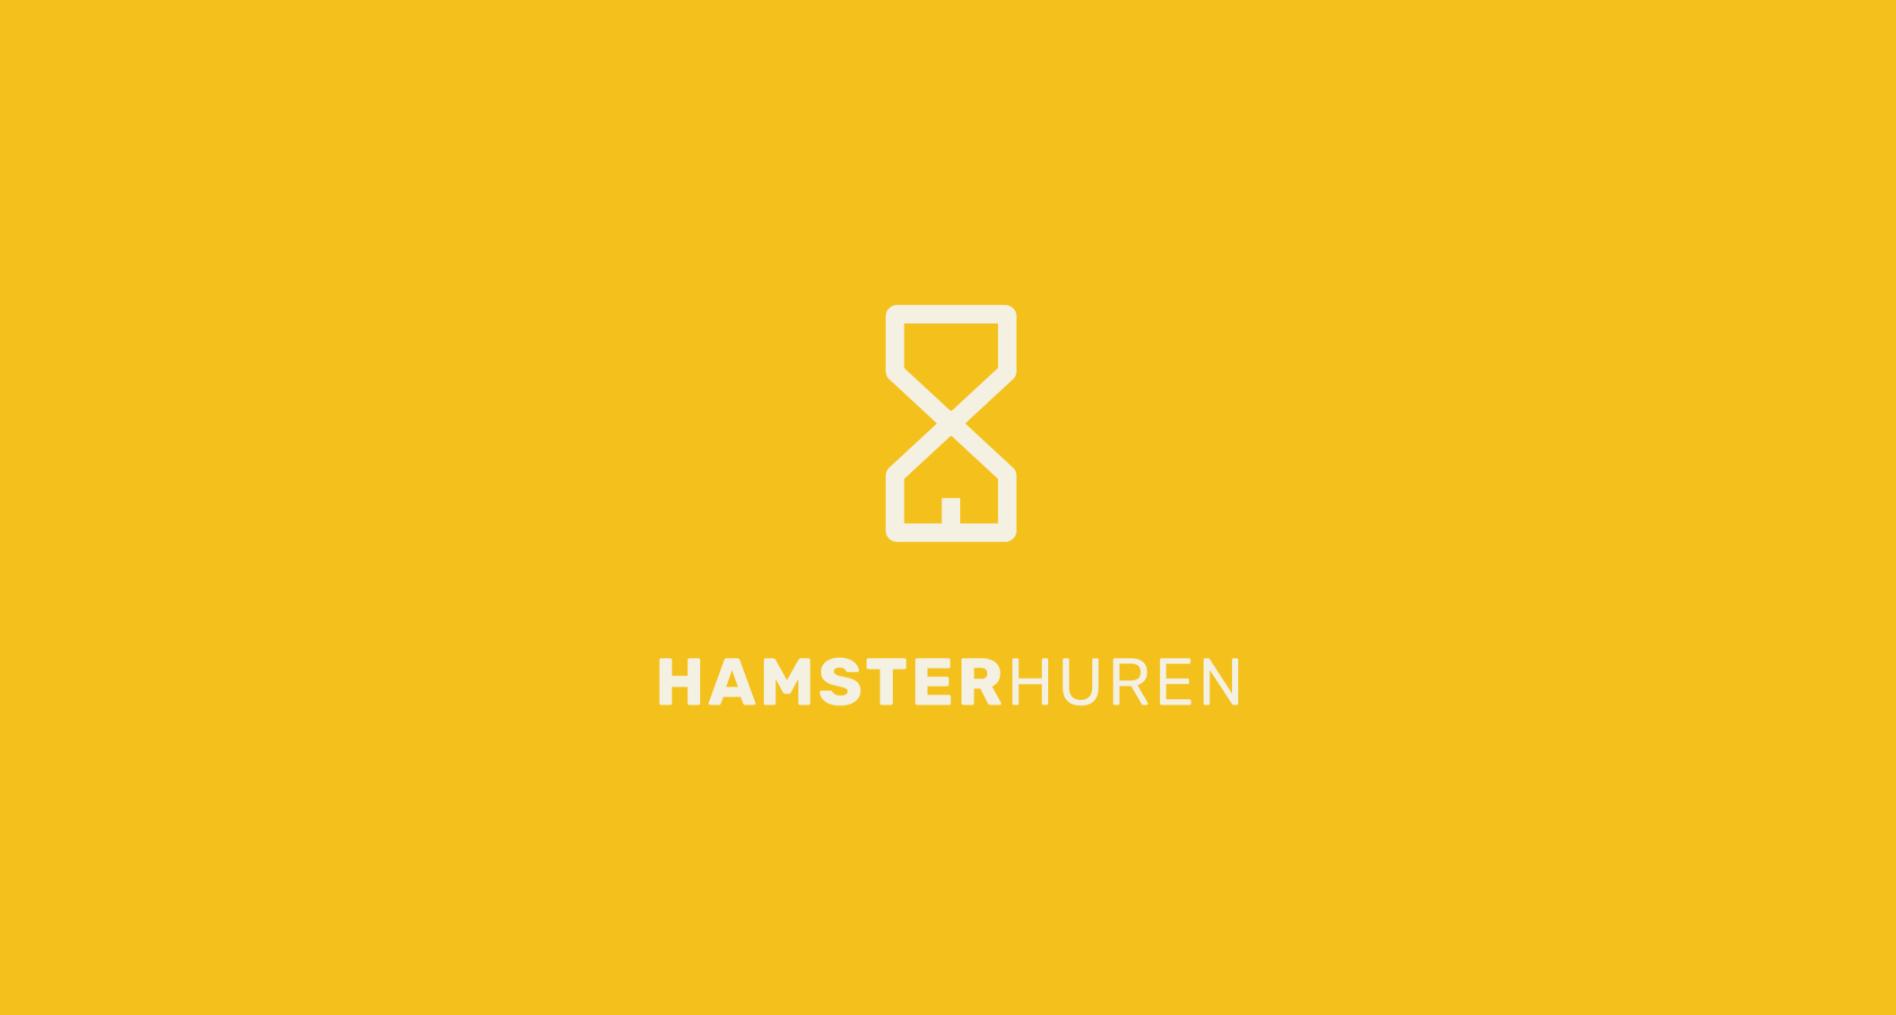 Hamsterhuren video thumbnail